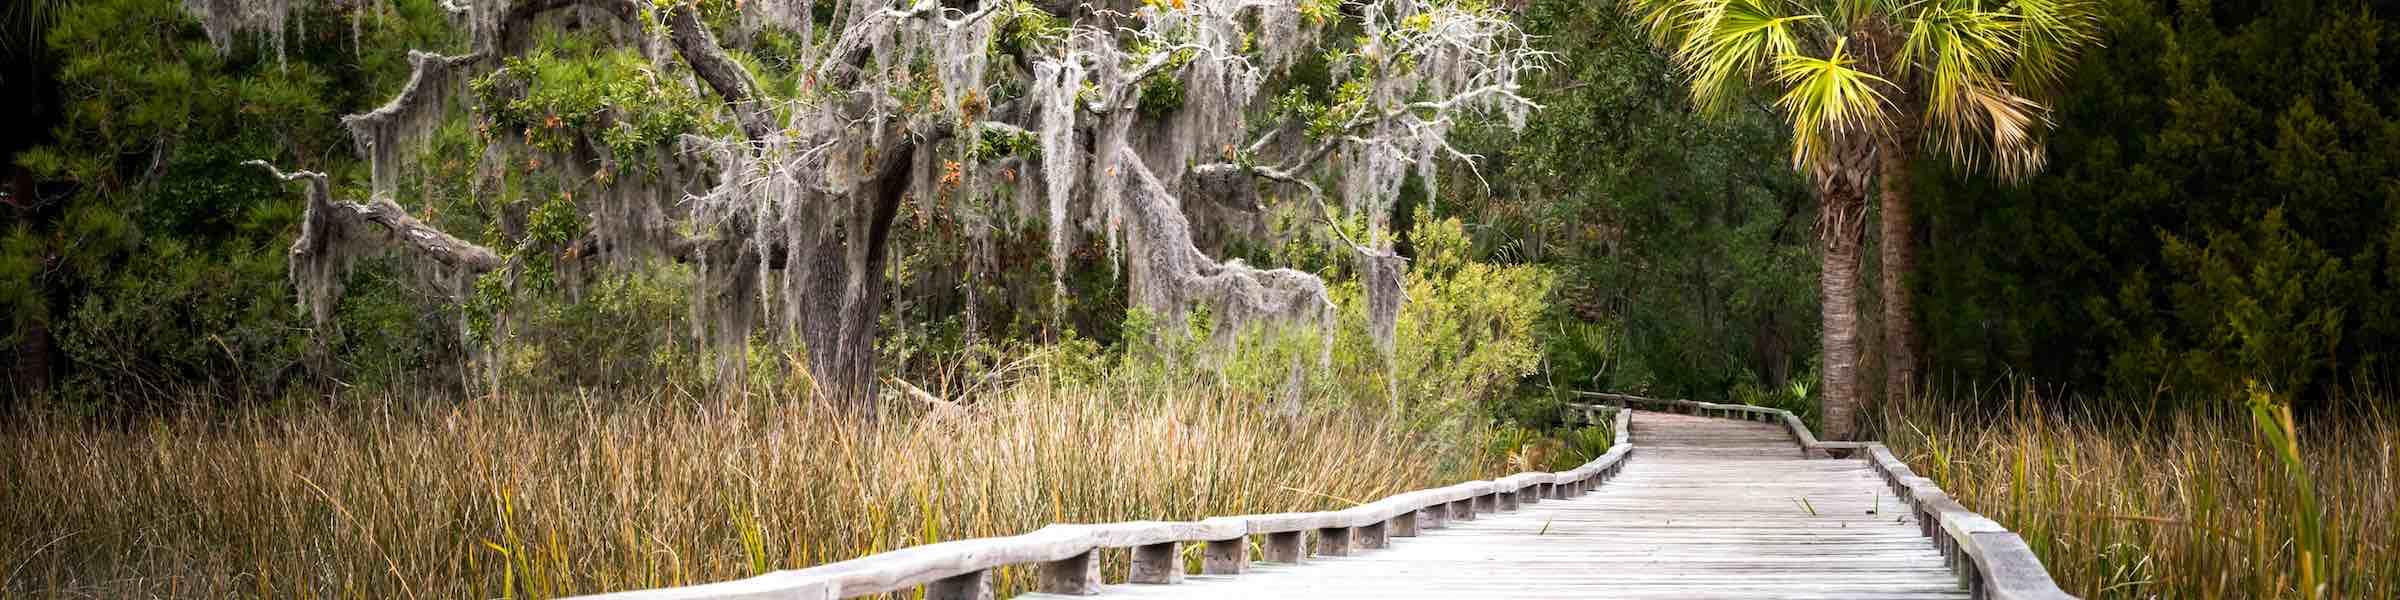 A boardwalk through the marsh landscape near Savannah, GA.